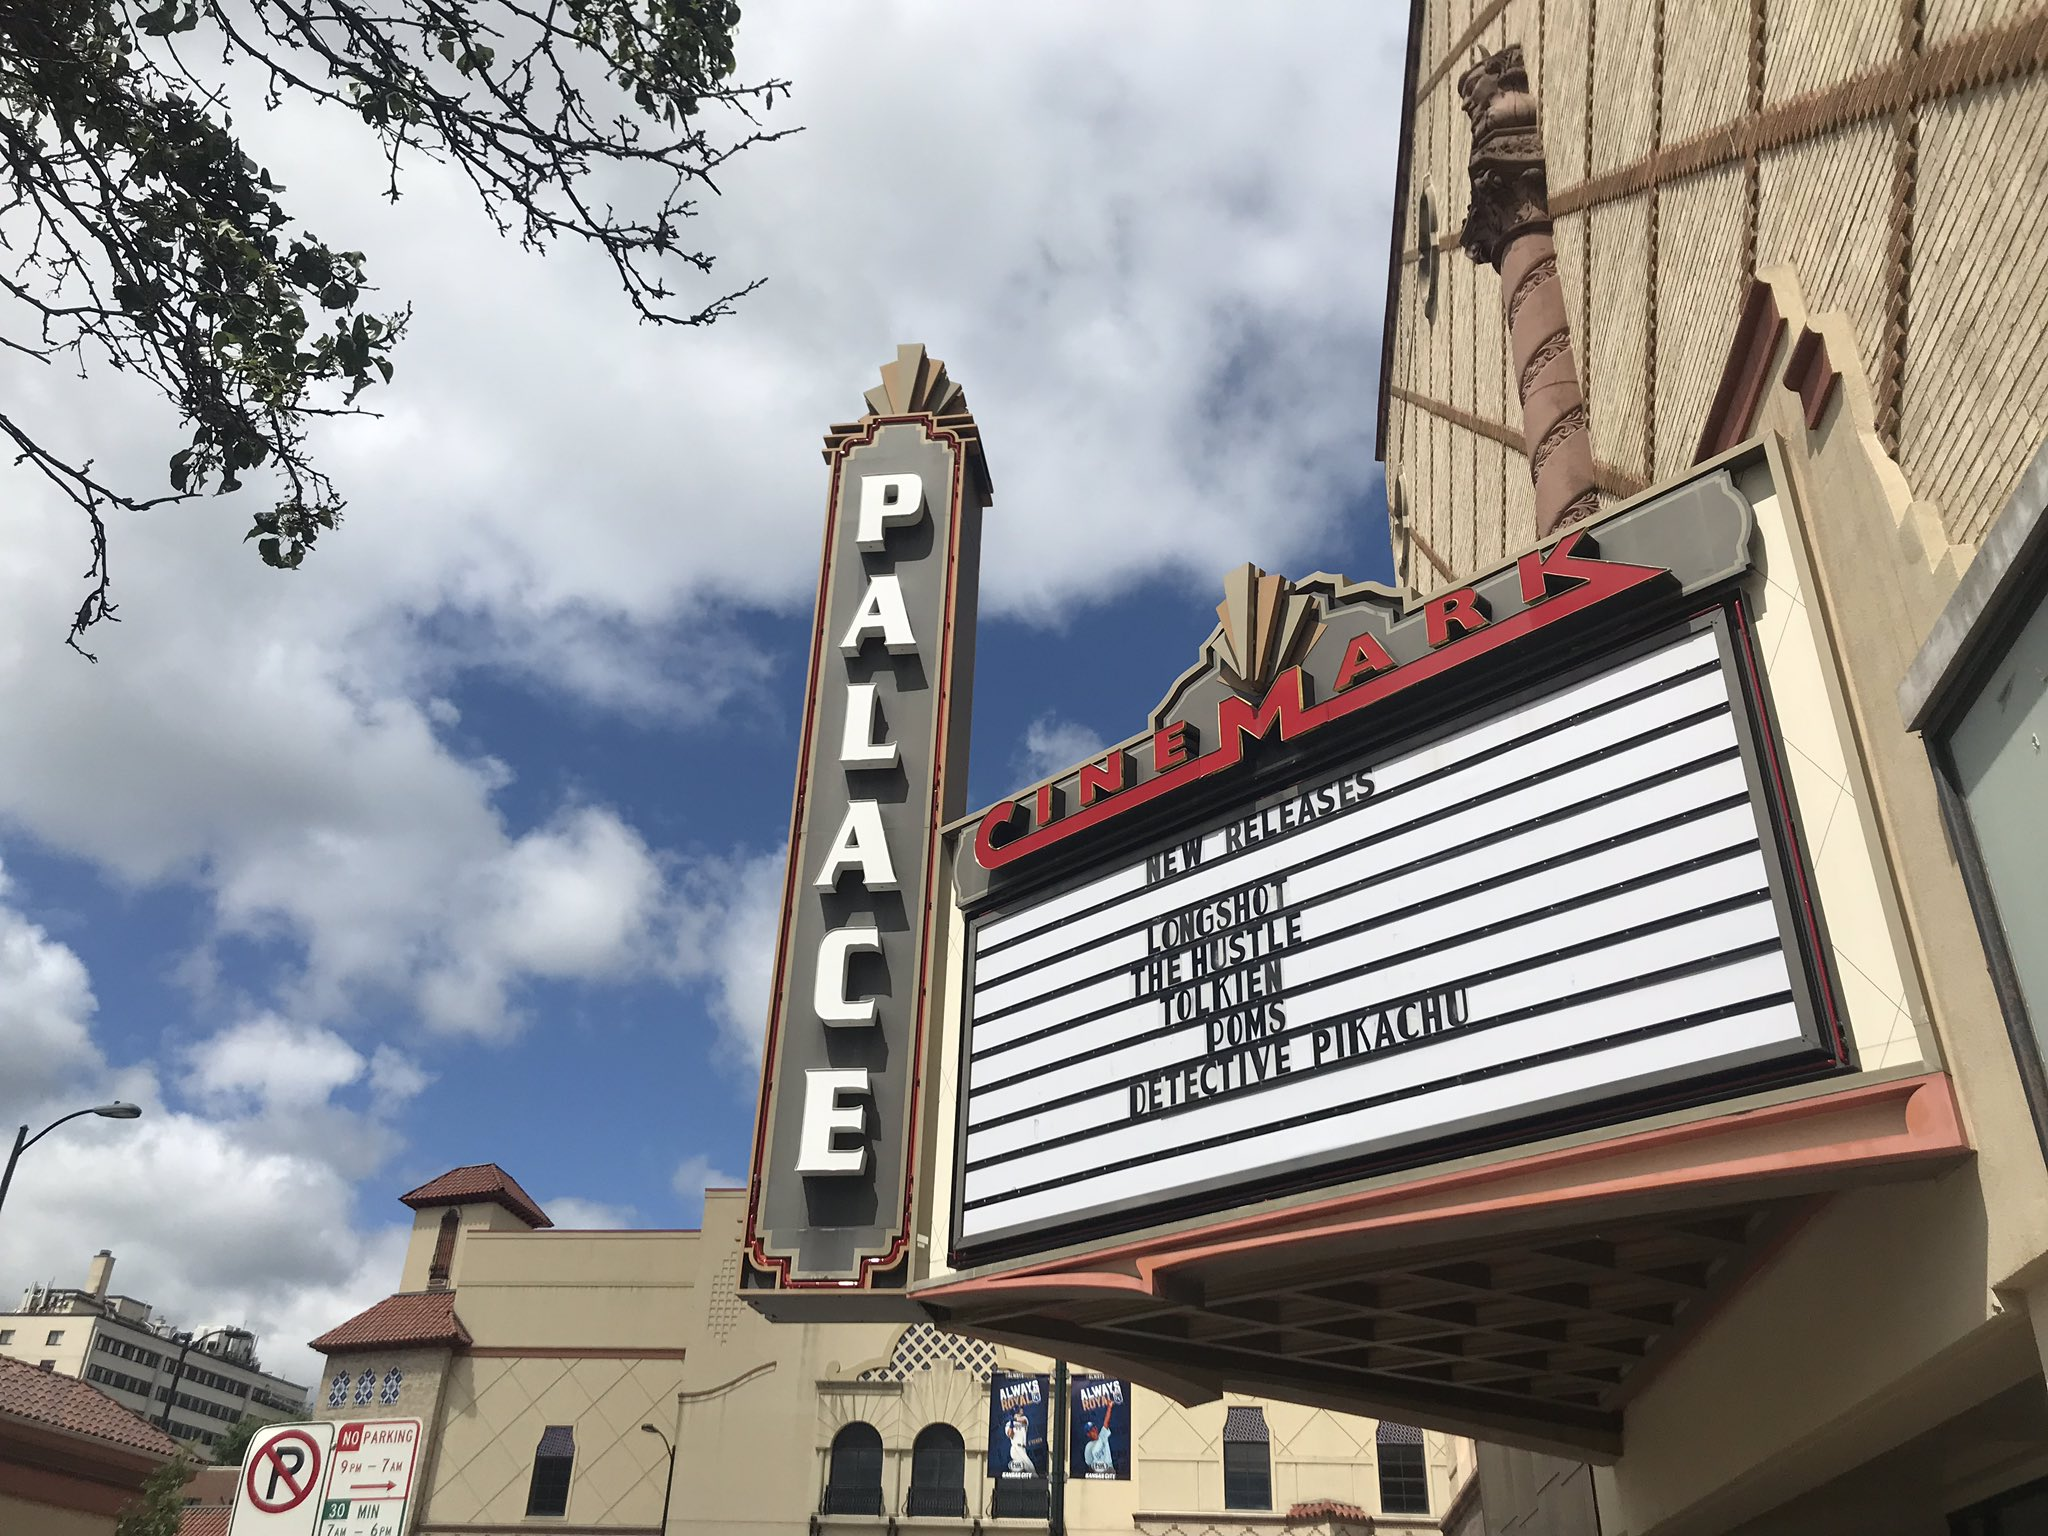 Curtains close for good at Cinemark Palace at the Plaza